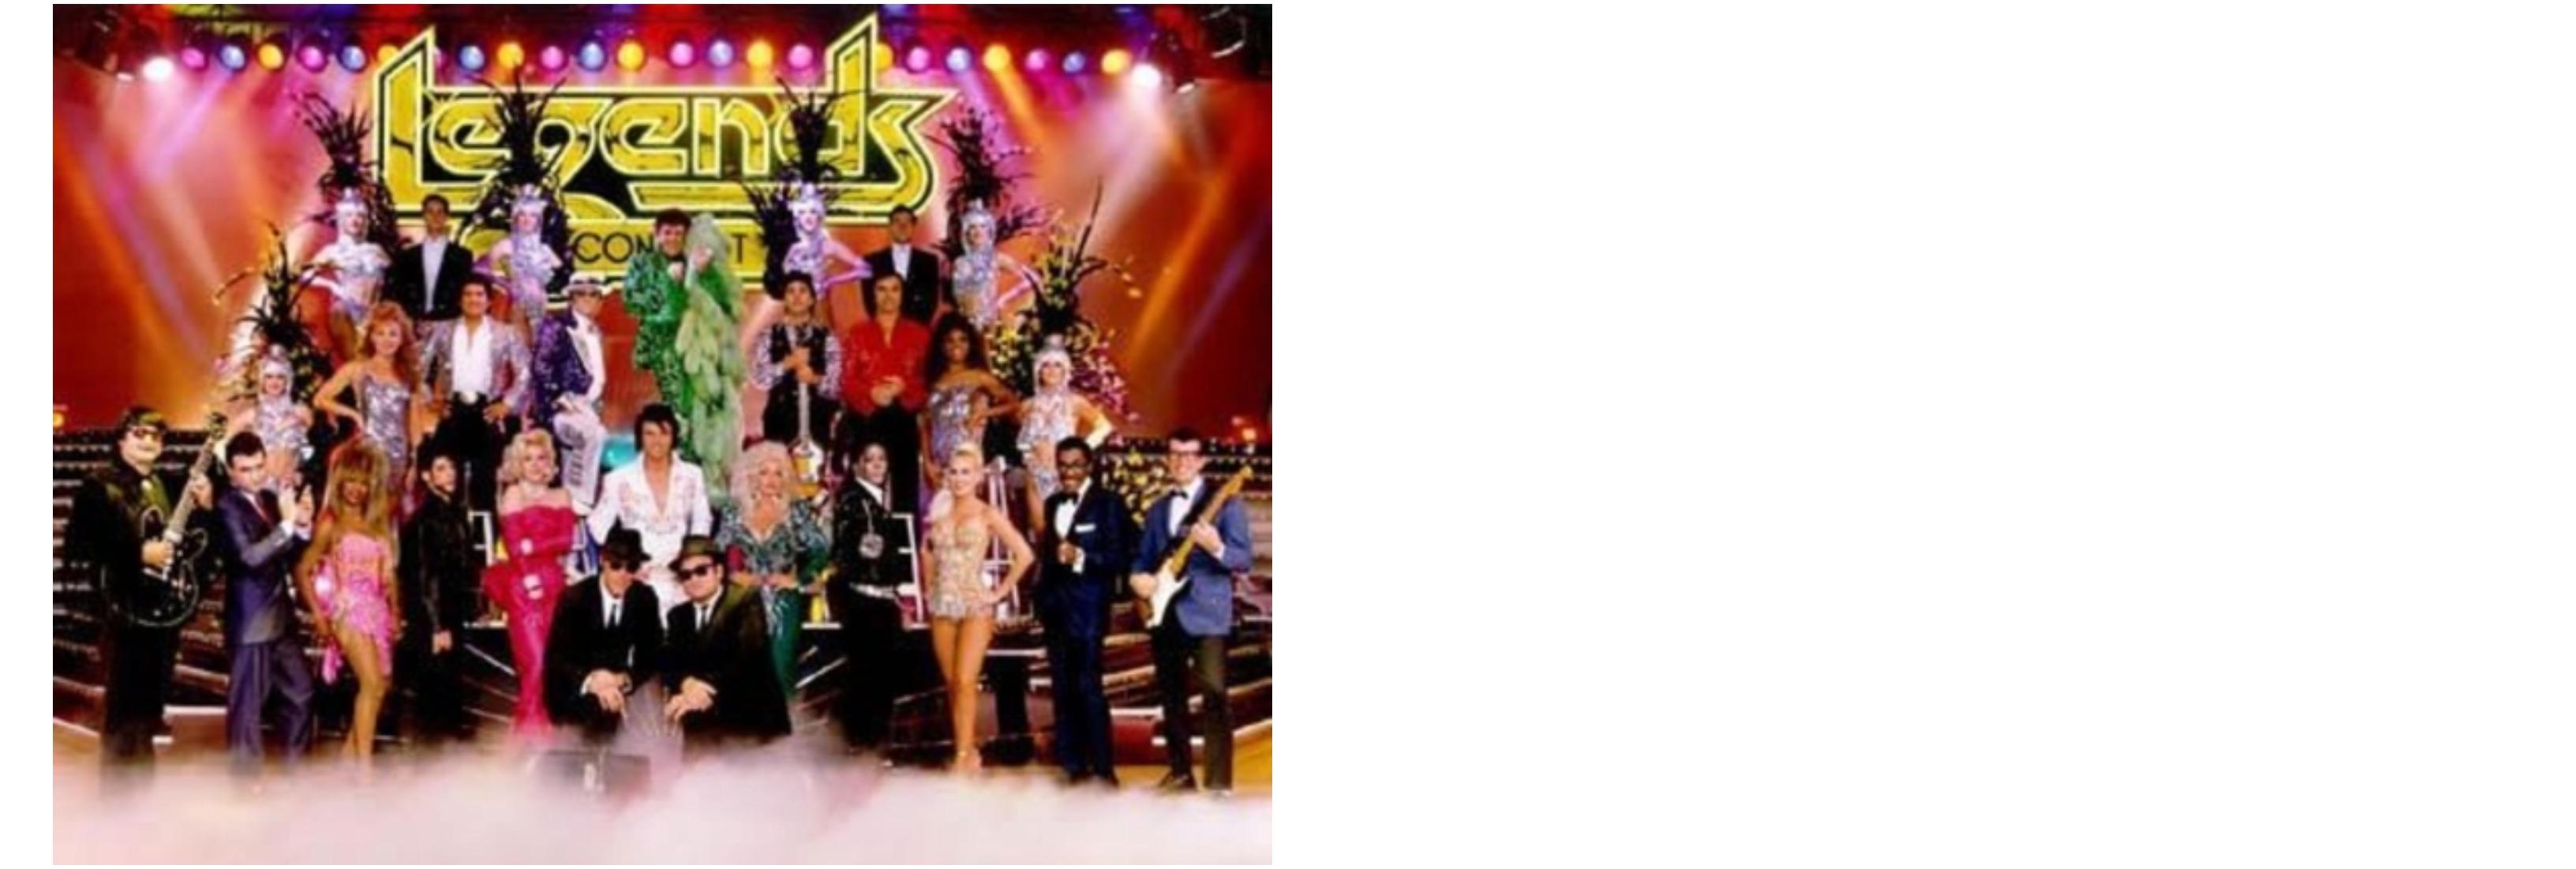 Legends concert Kiesha Wright Tina Turner tribute